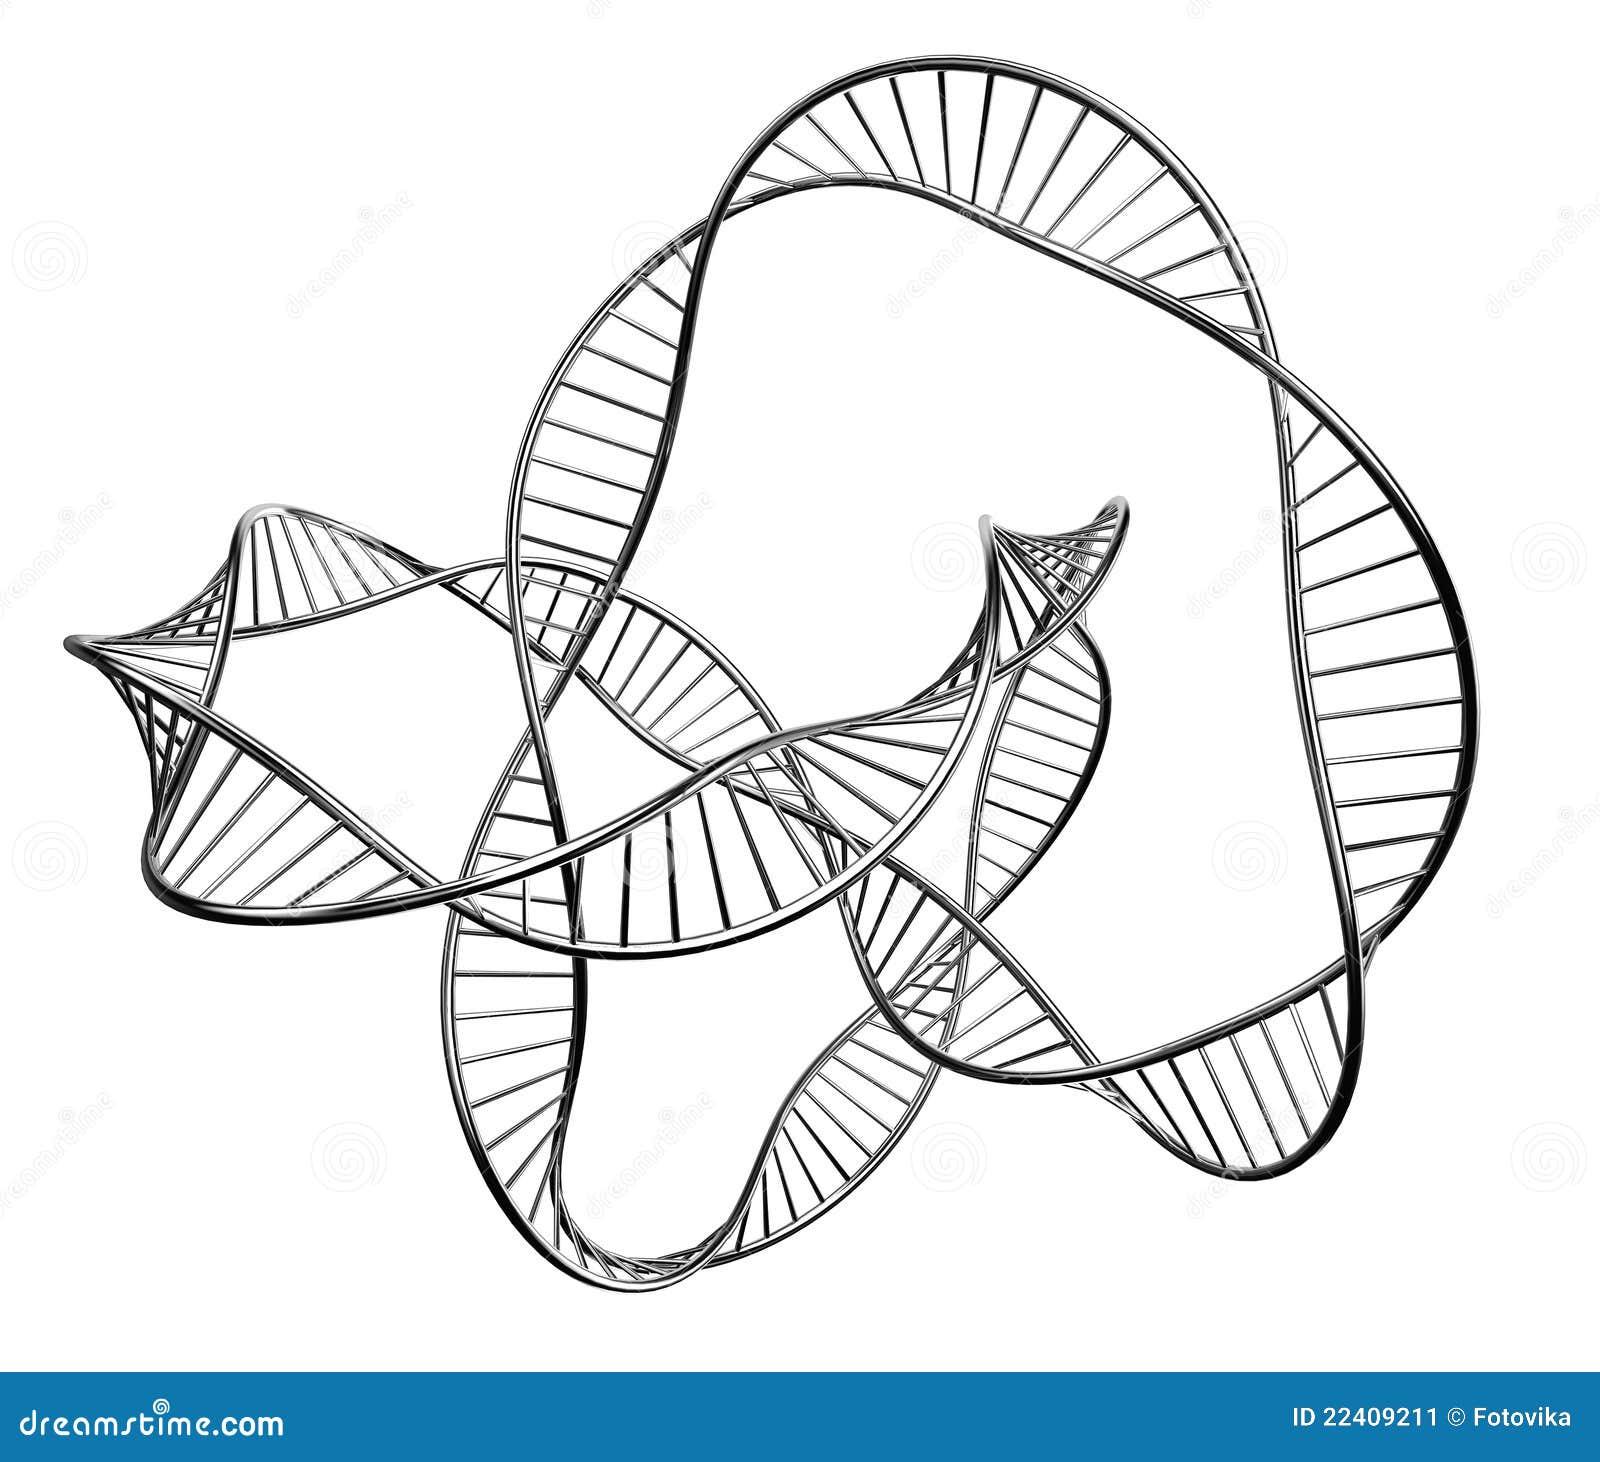 Illustration d une ADN